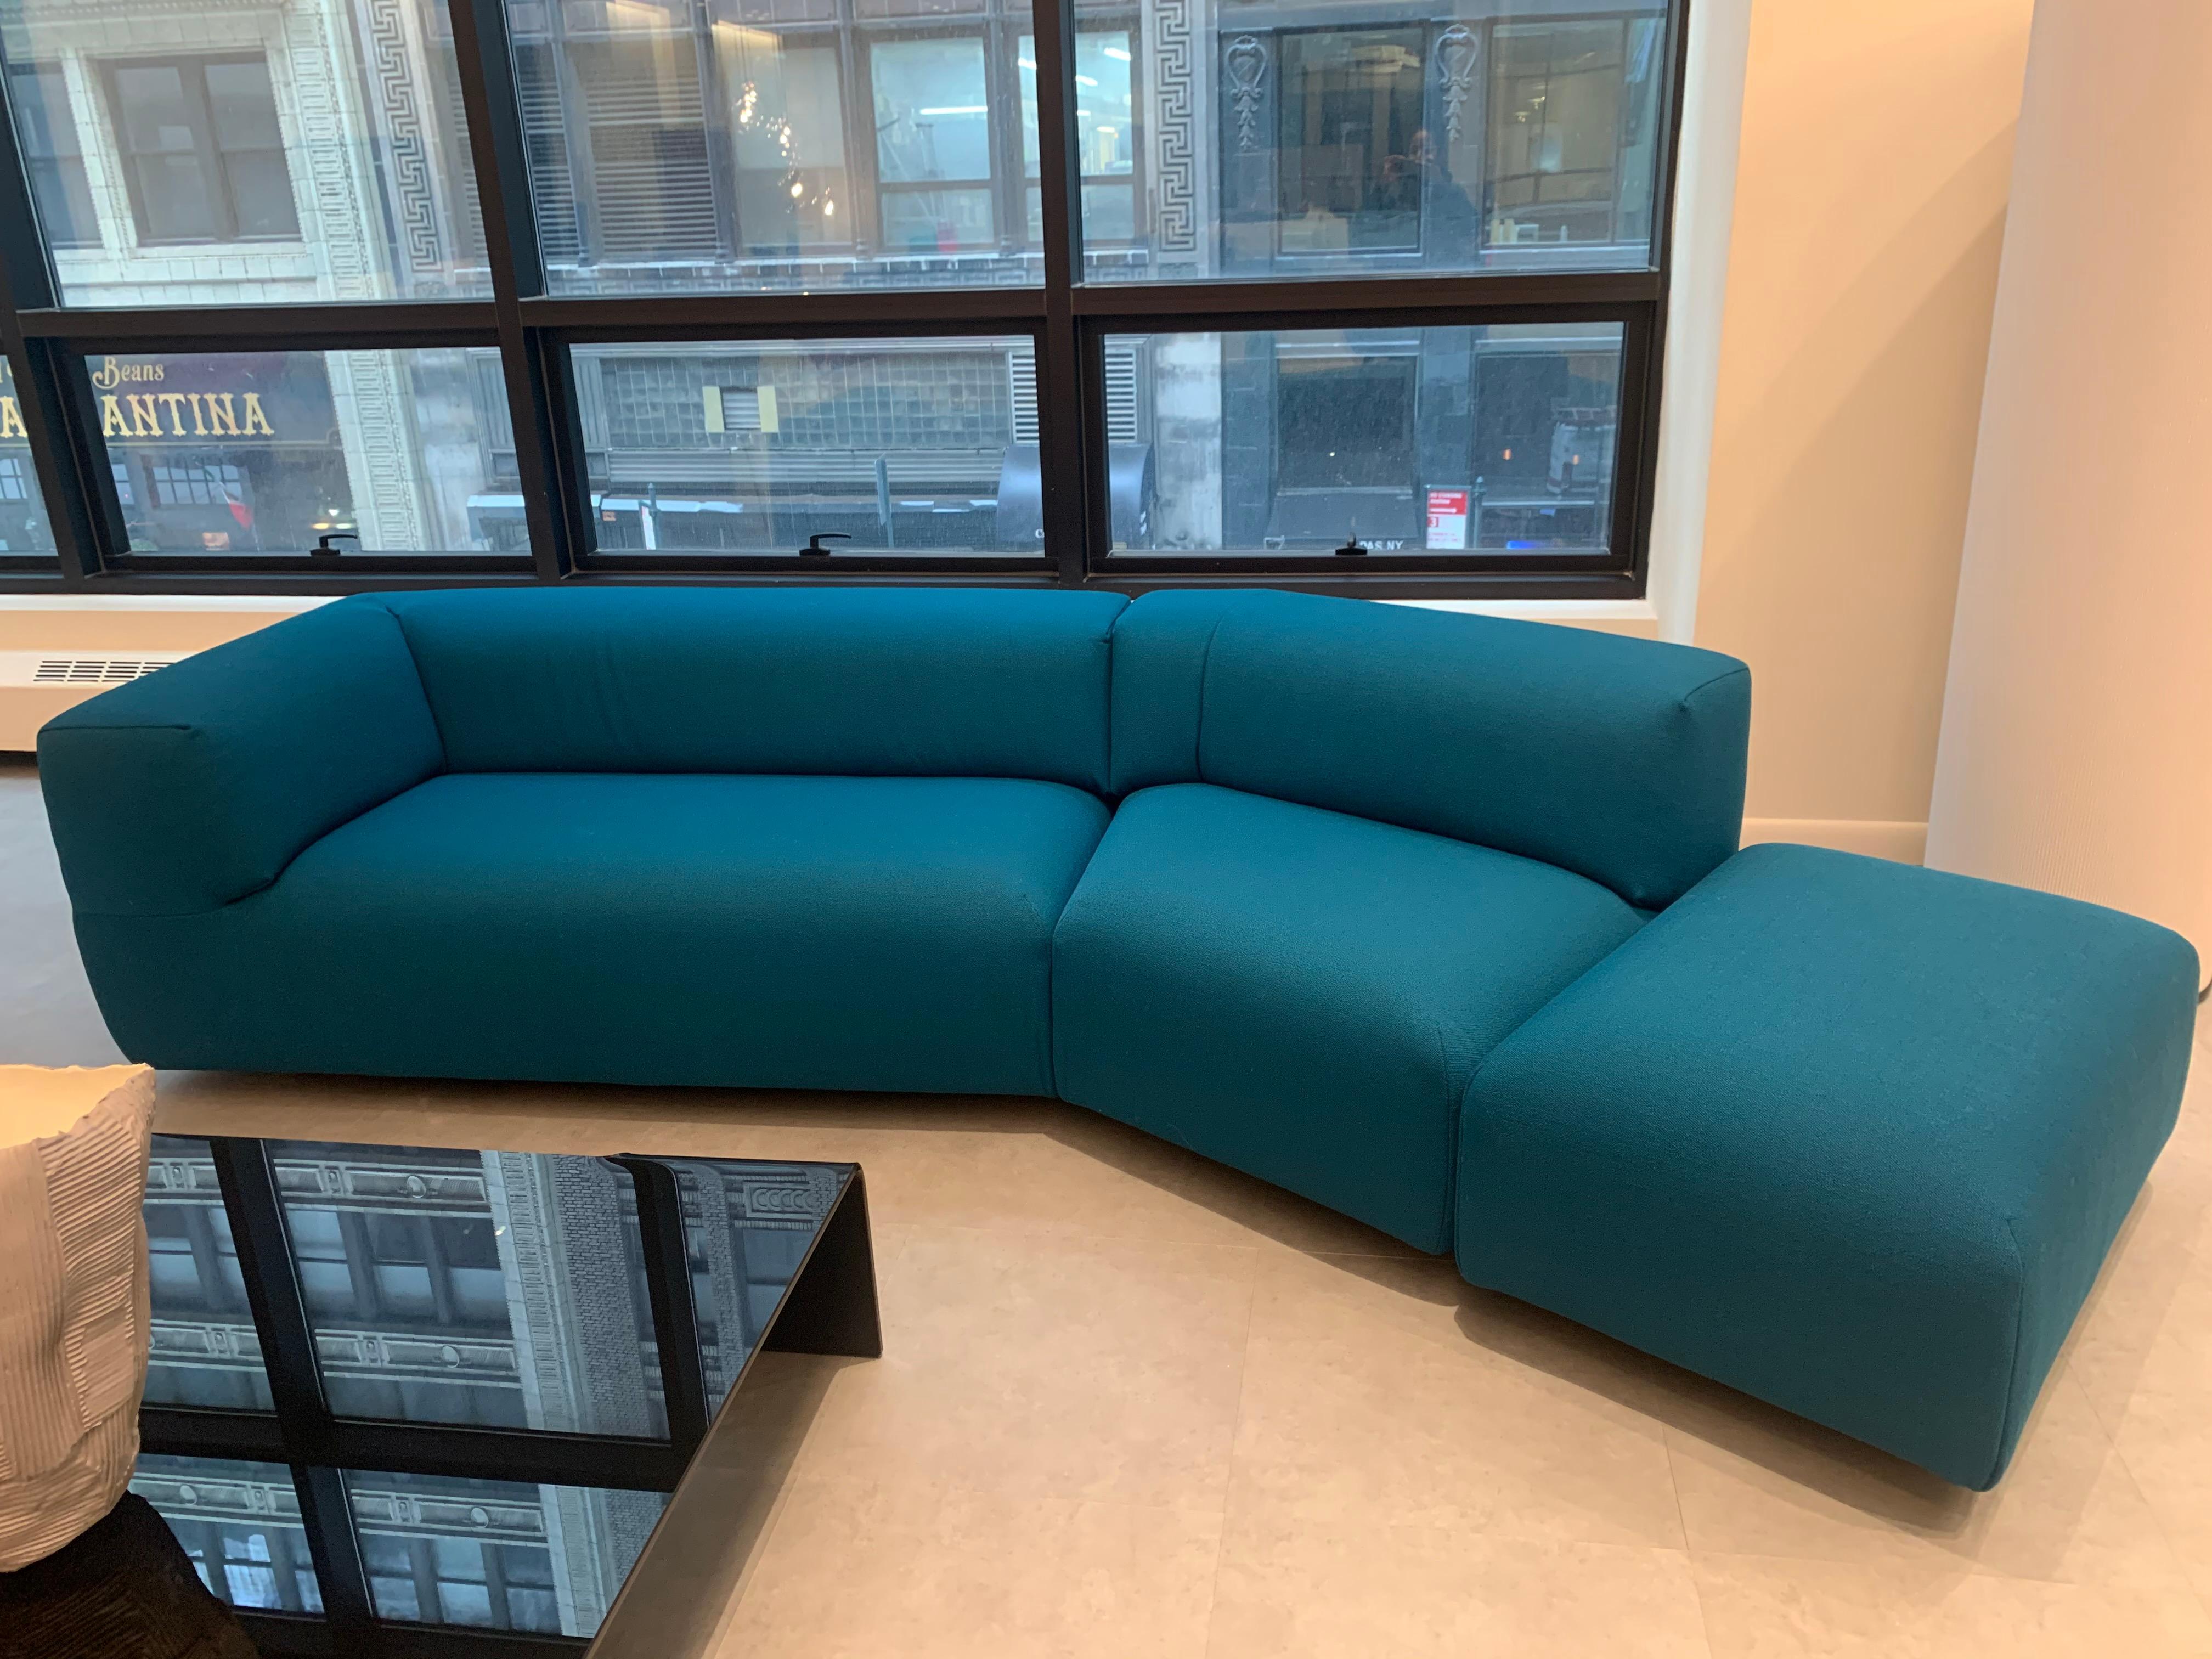 Montis Aztec 2.5-Seat Sofa Upholstered in Raf Simons Fabric